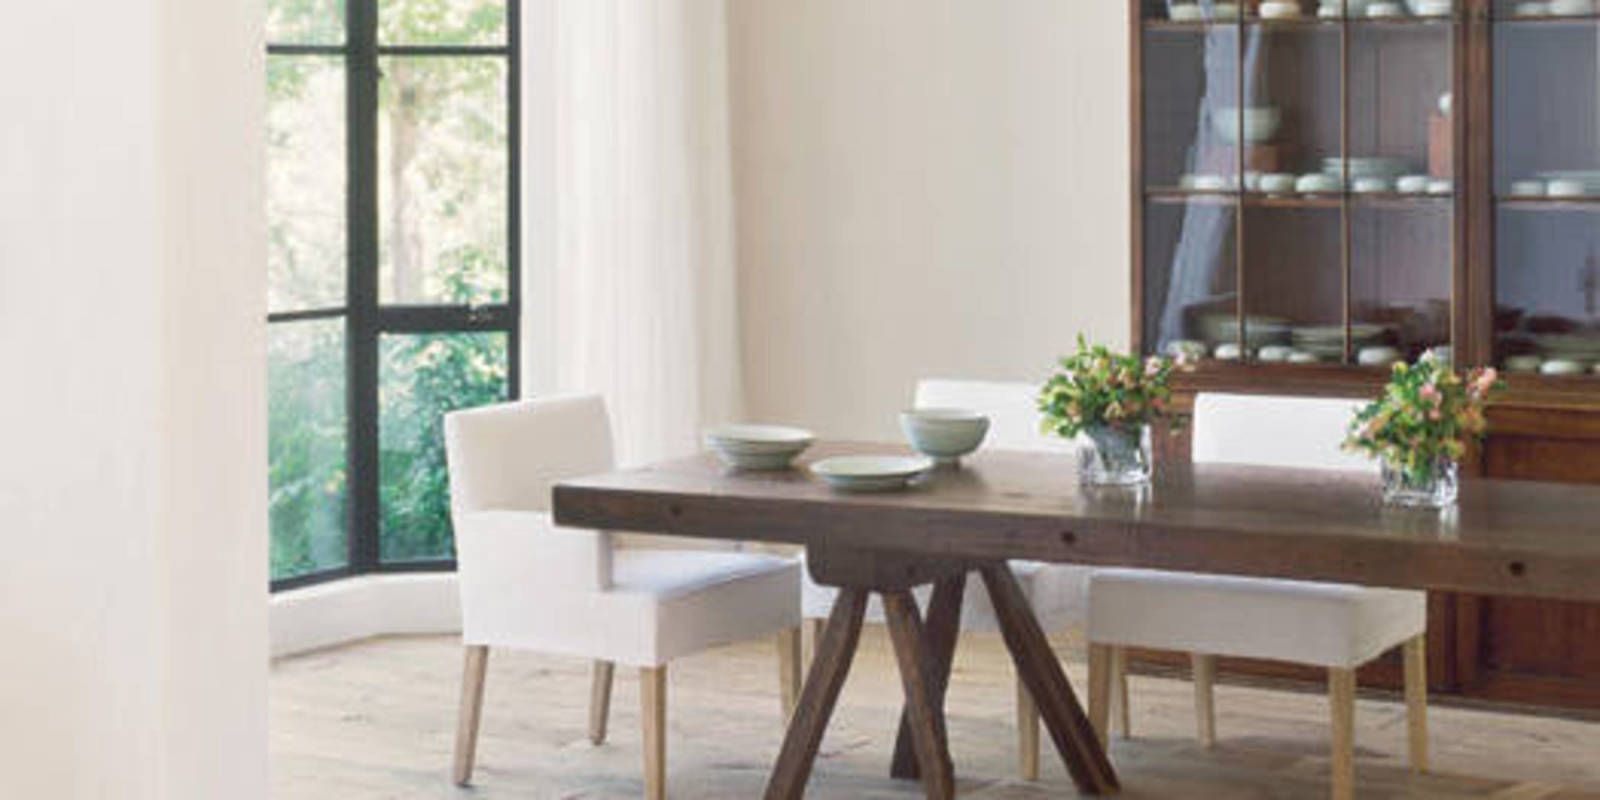 California Modern - Home Design